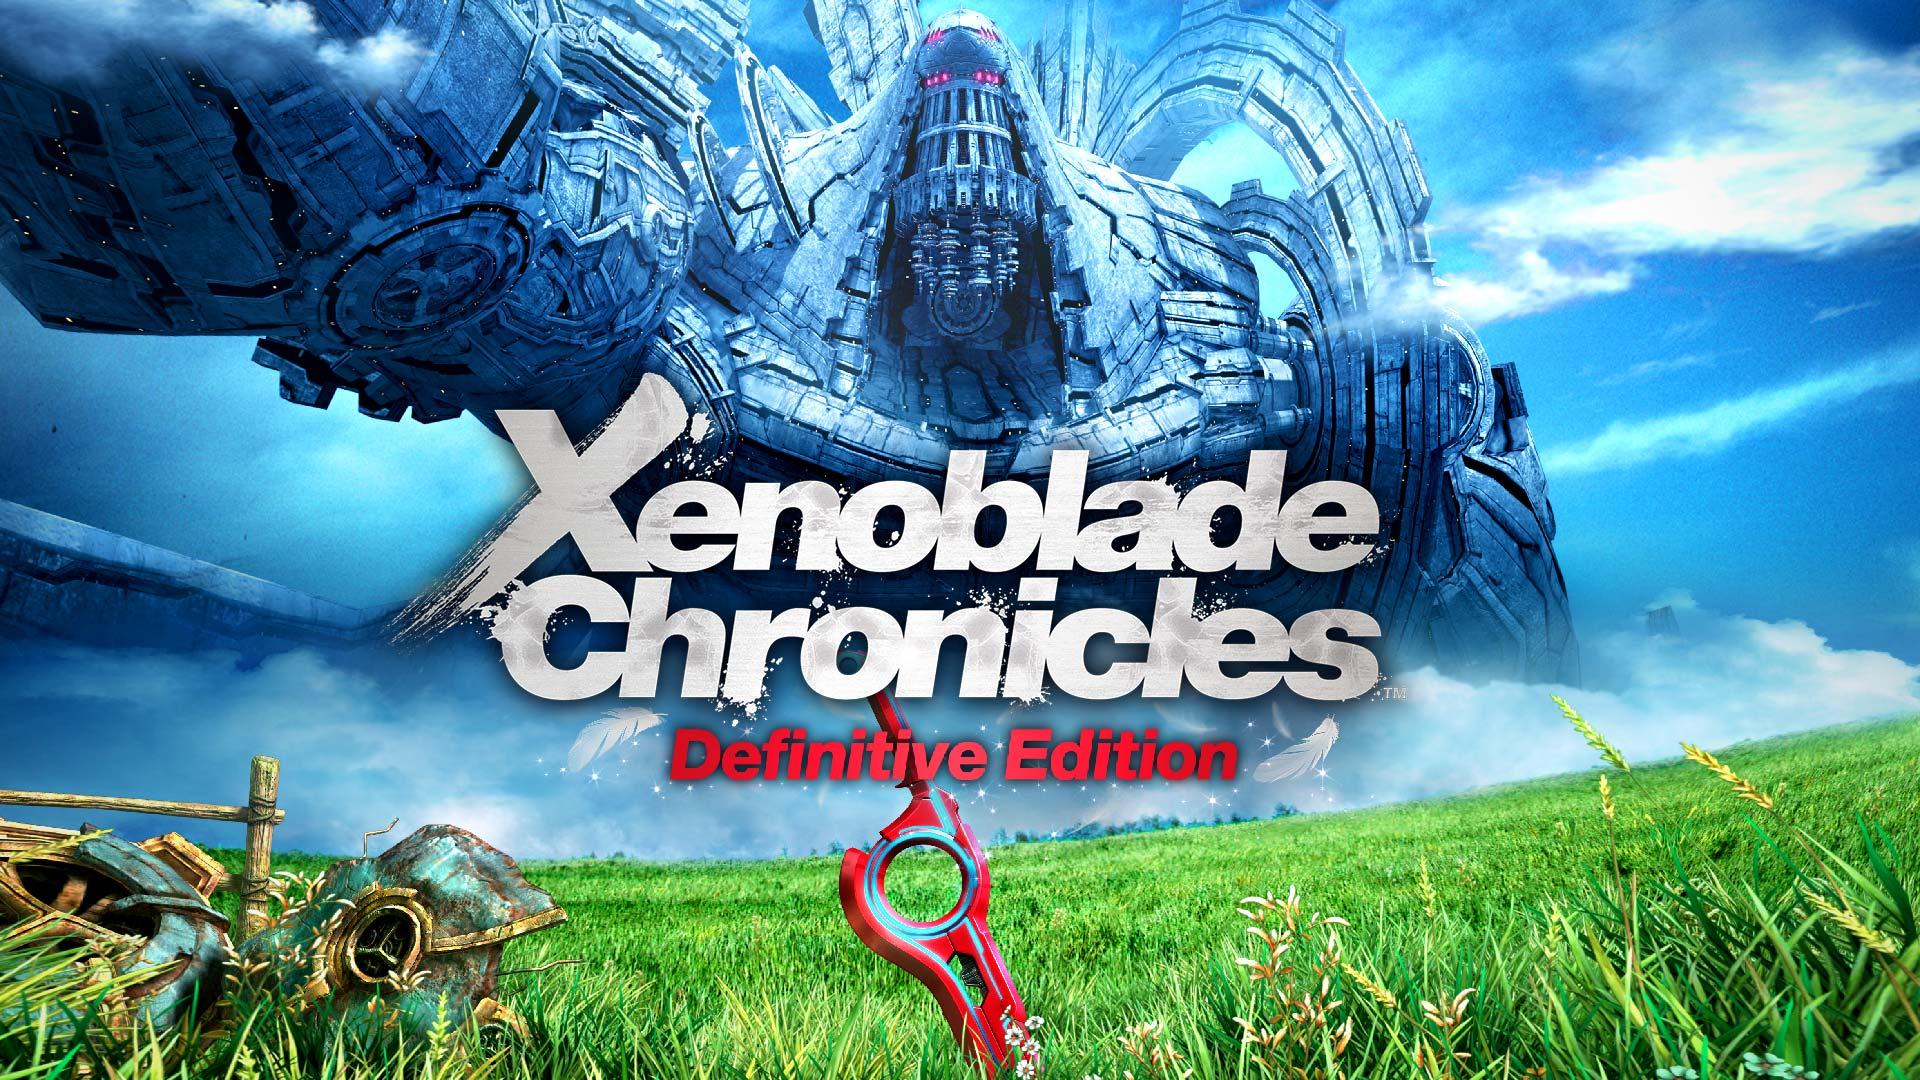 xenoblade chronicles, flee